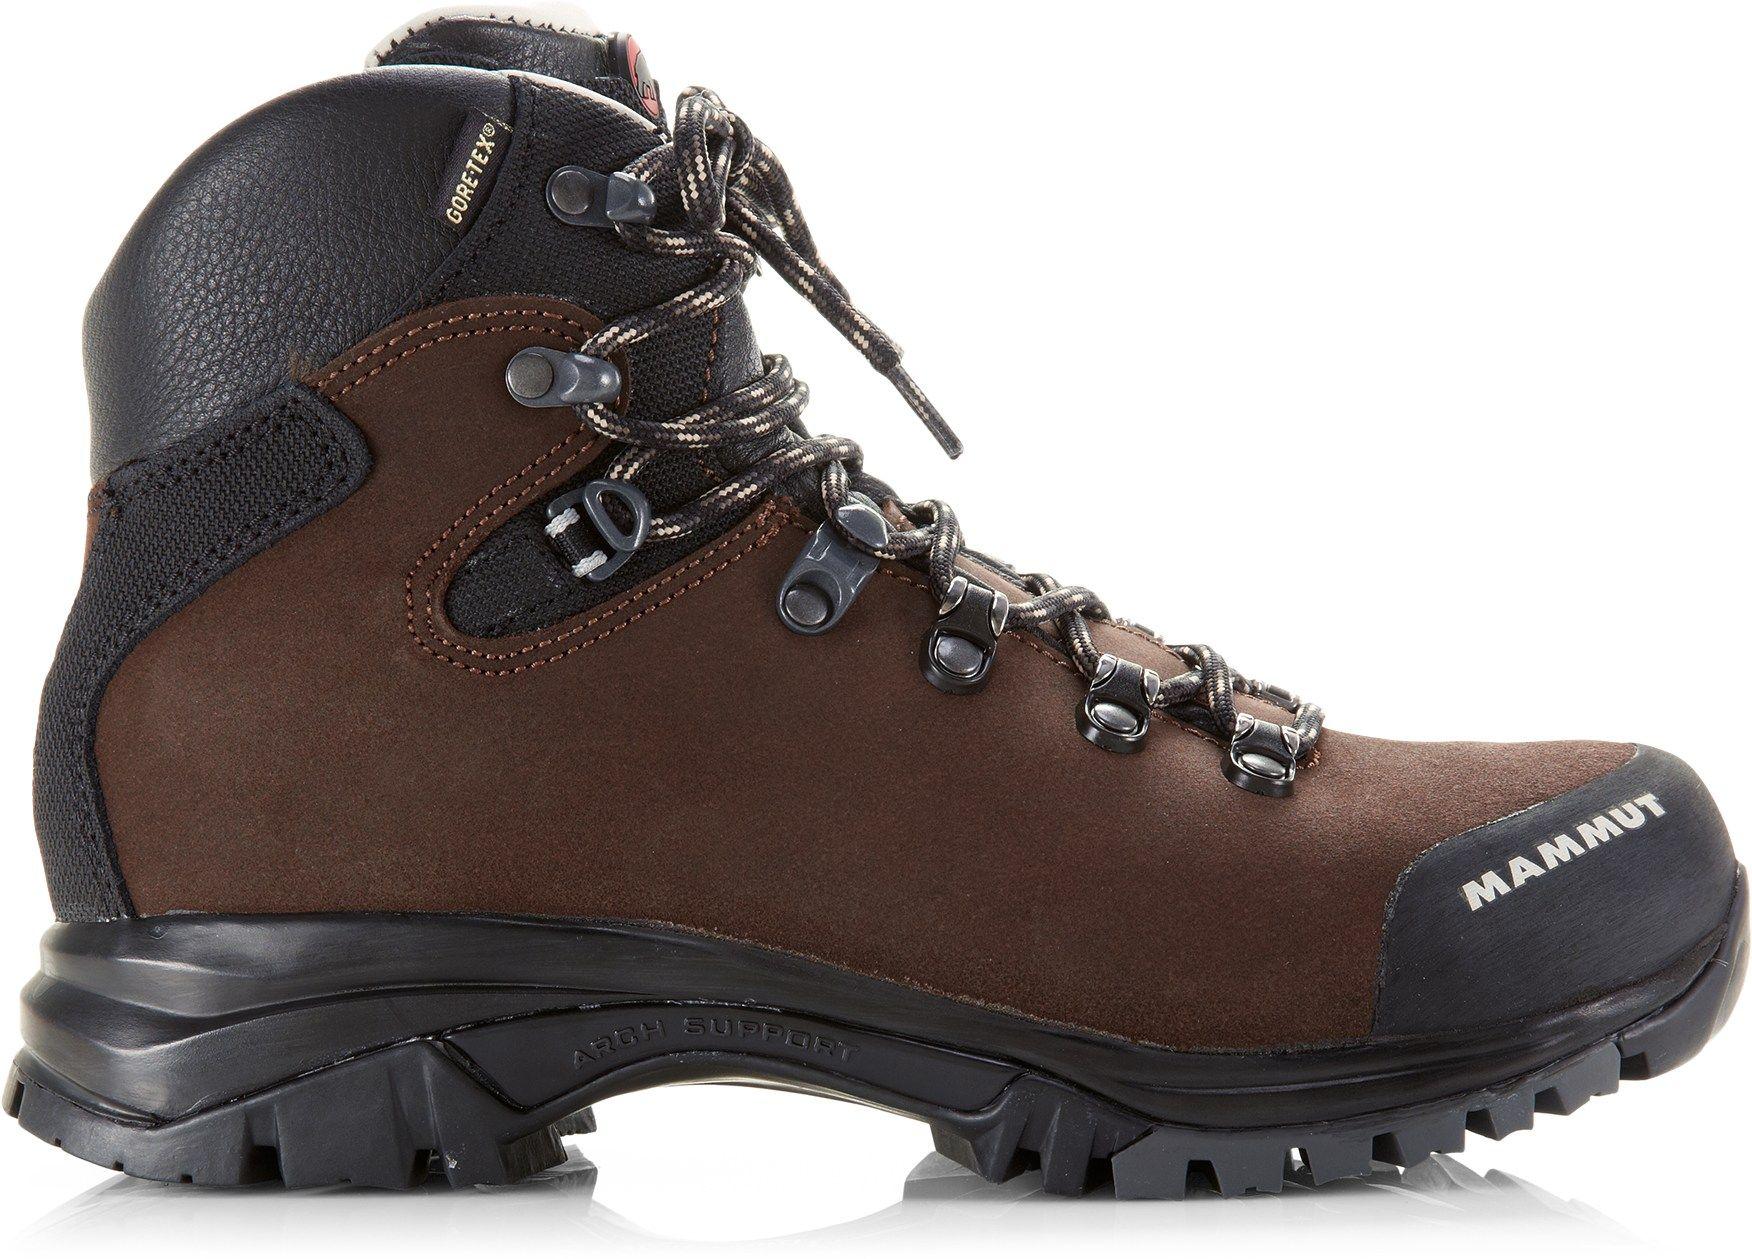 a50a0ca38fd Brecon II GTX Boots - Women's   Hiking   Boots, Hiking boots, Hiking